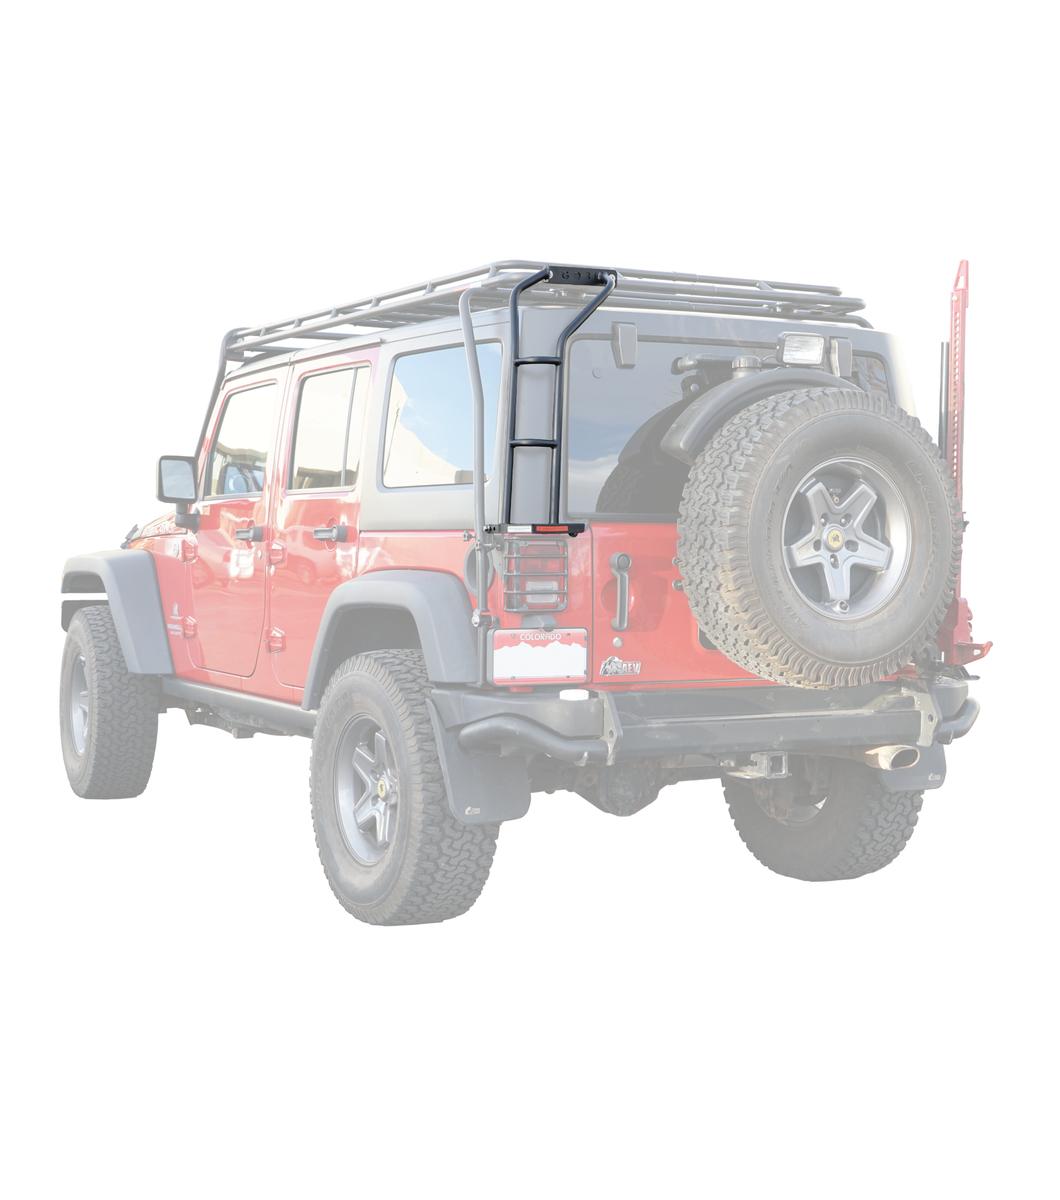 Gobi Jeep Wrangler Jk Rear Ladder Driver Side